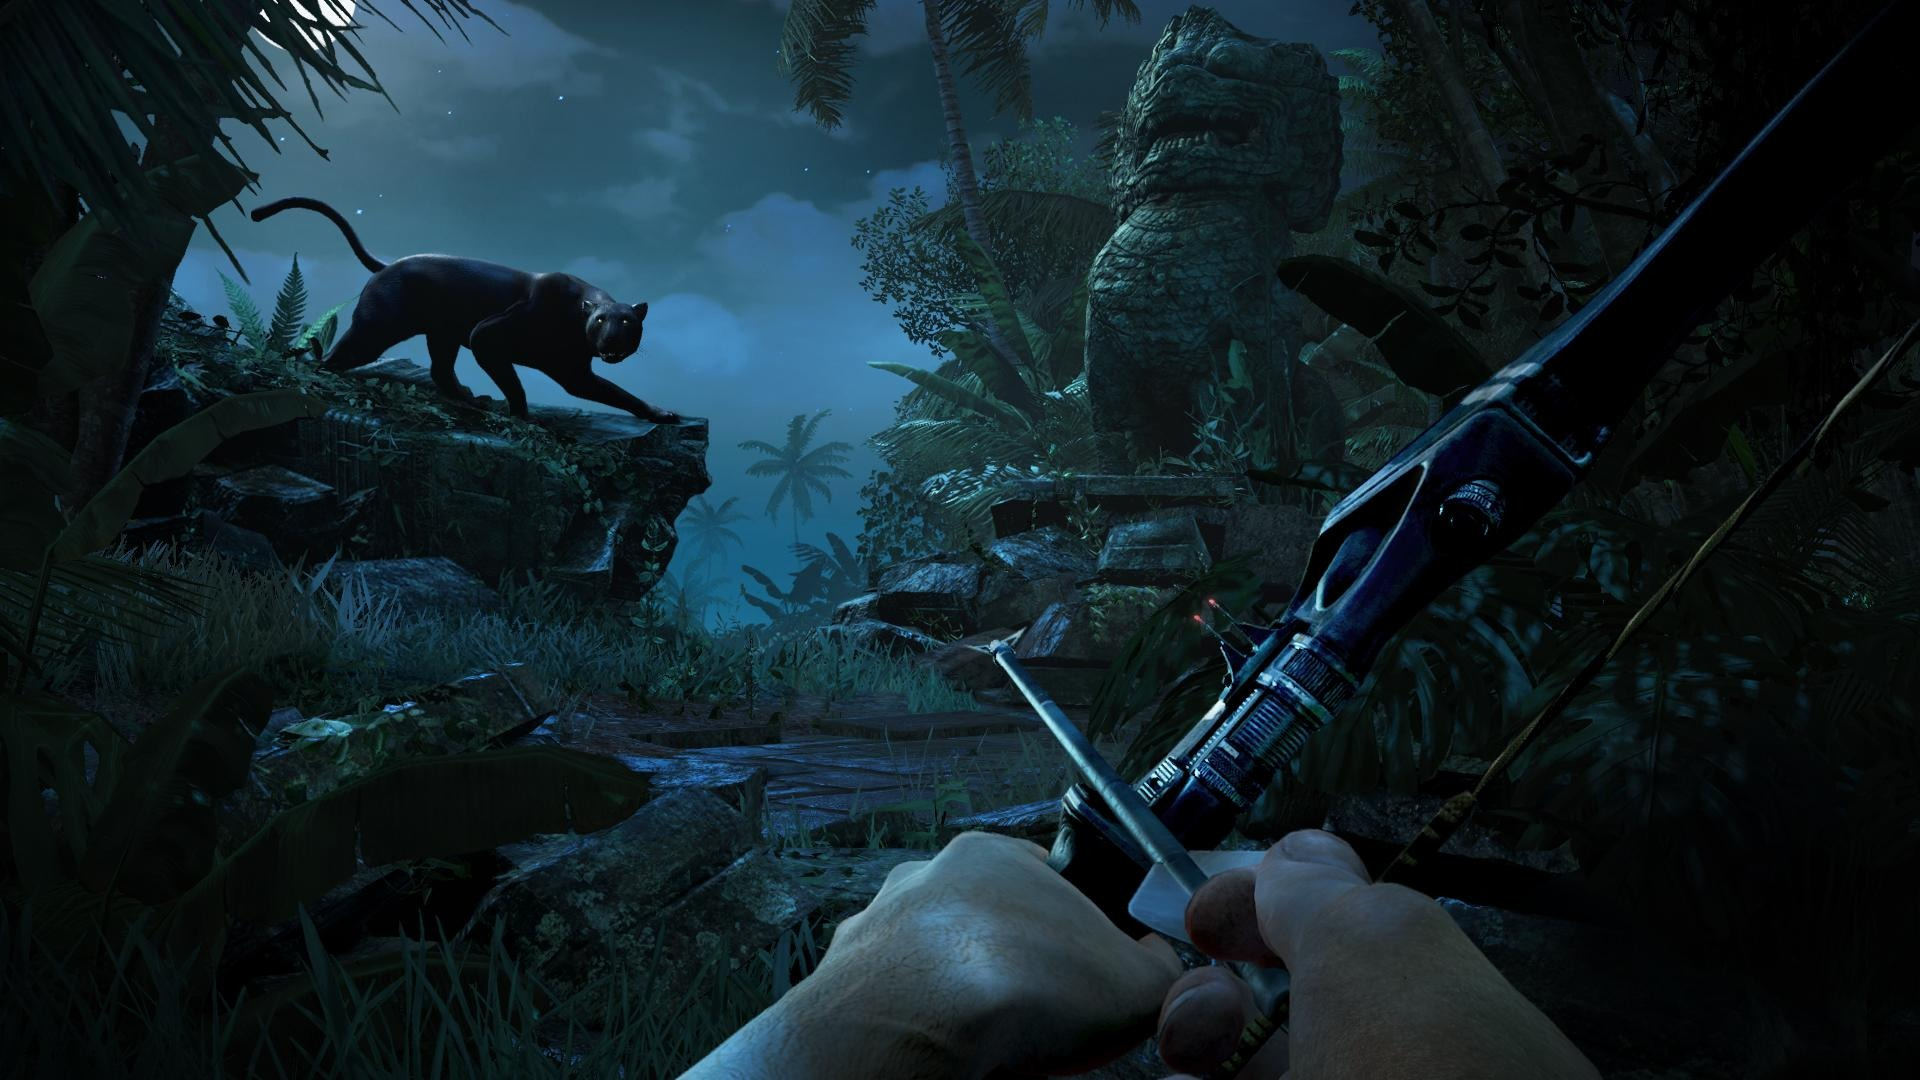 Far Cry 3 Wallpaper 1080p